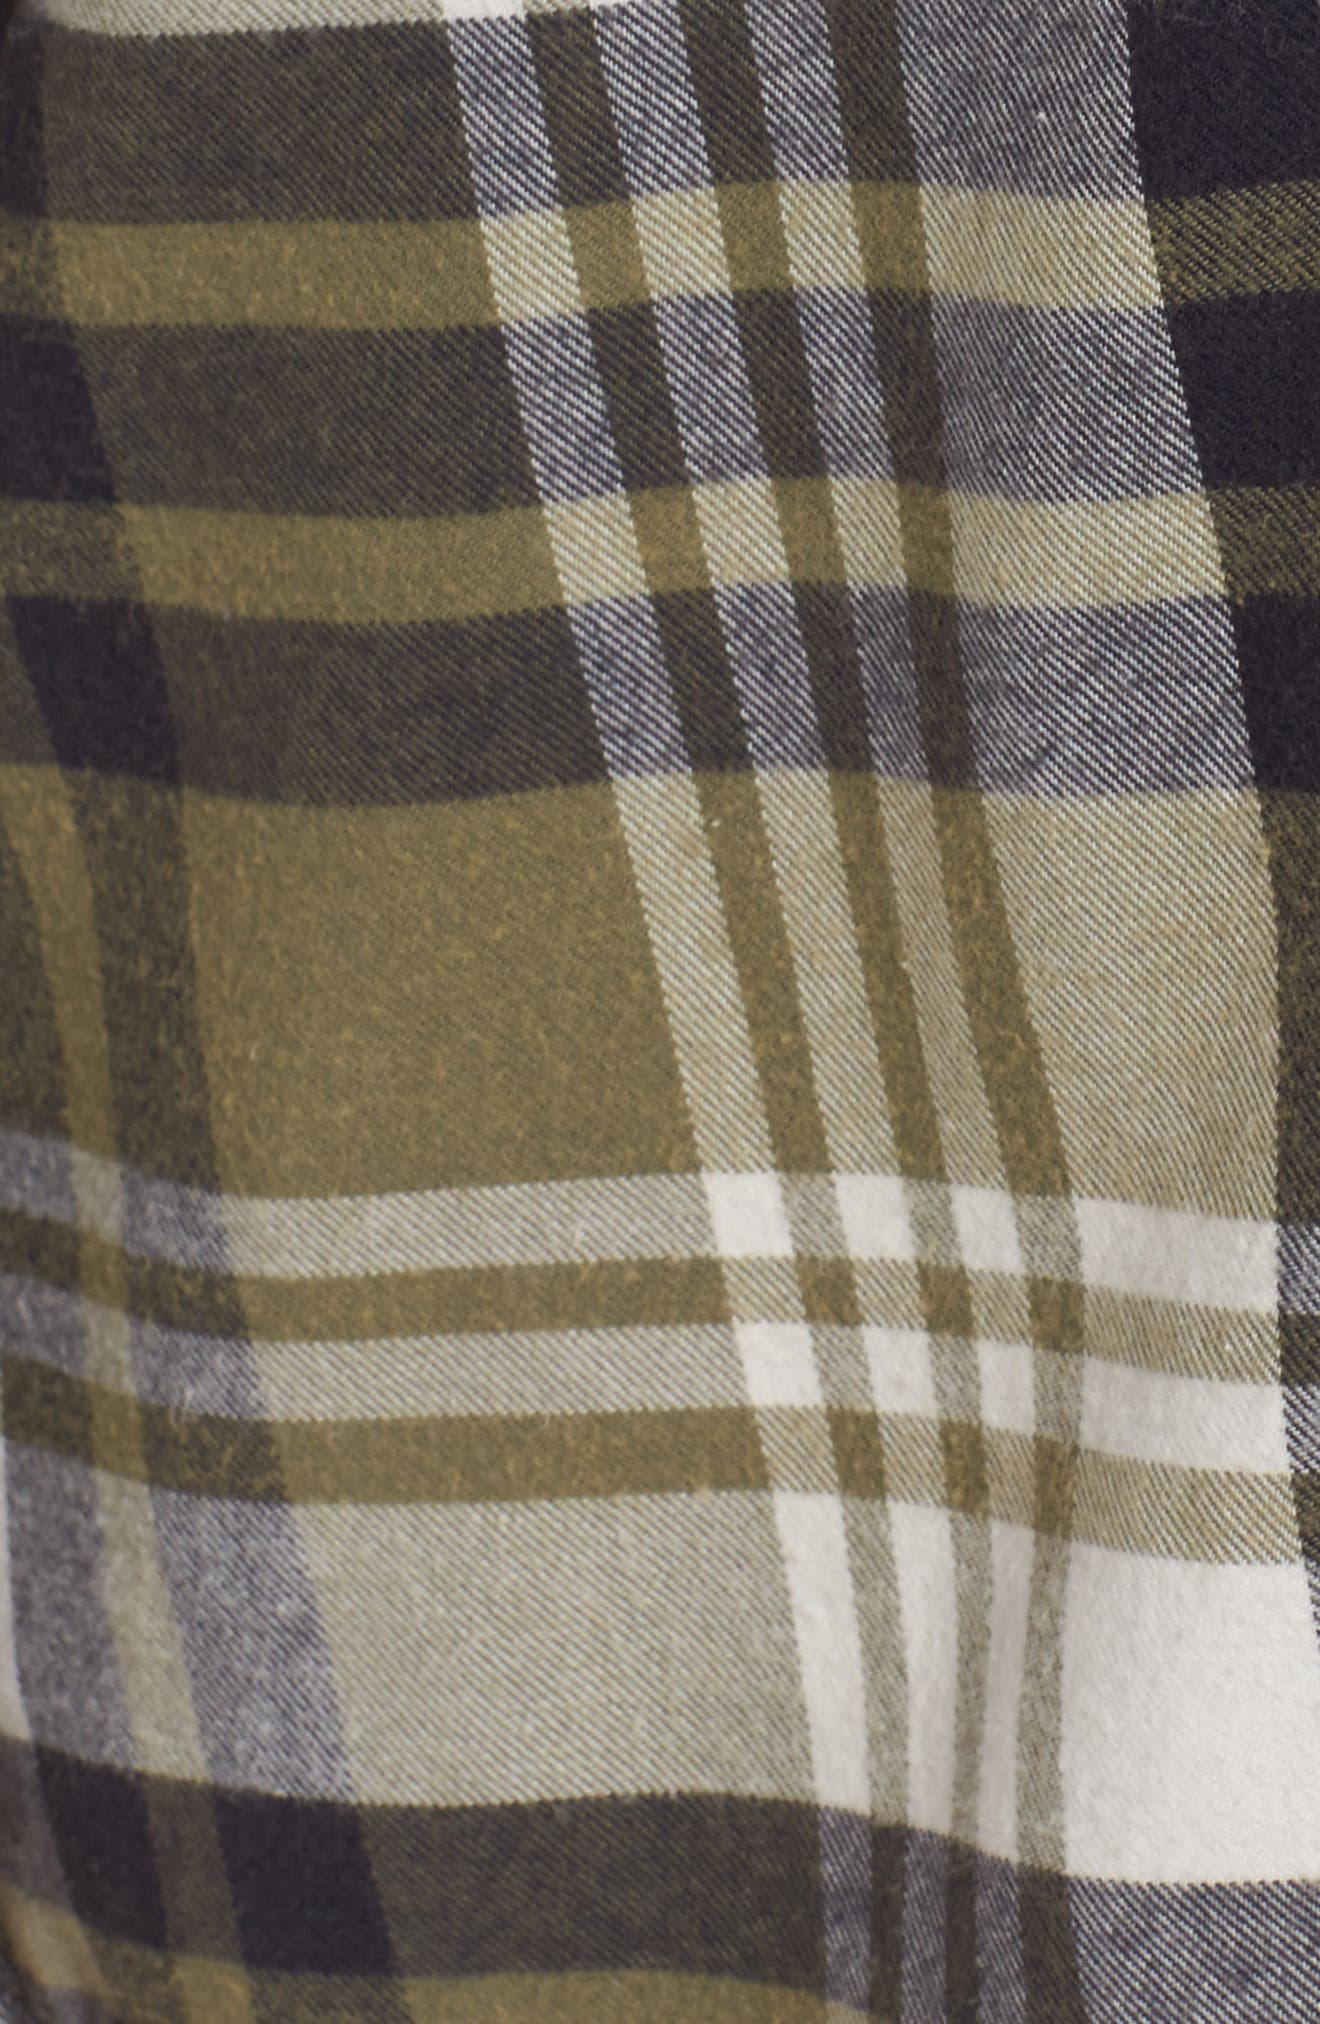 Plaid Cotton Blend Nightshirt,                             Alternate thumbnail 5, color,                             Olive Grove Pepper Plaid